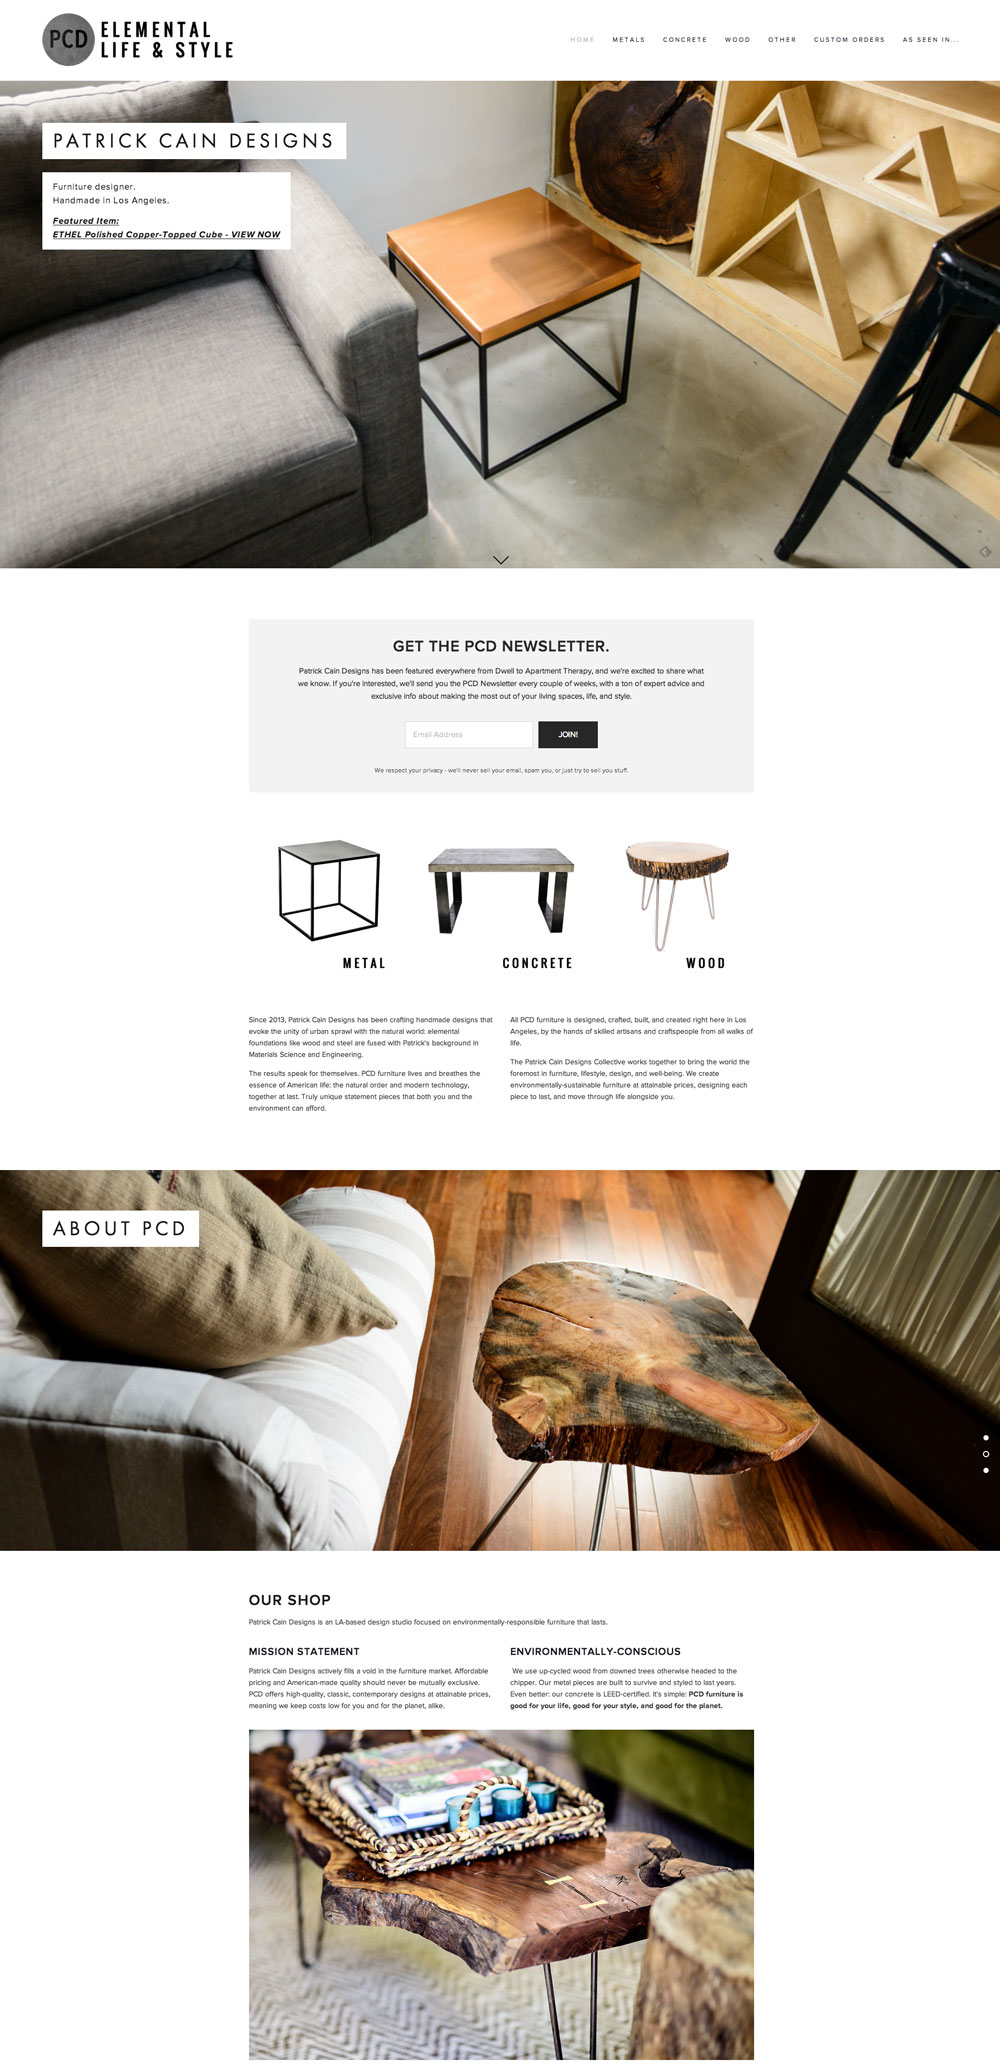 Patrick Cain Designs